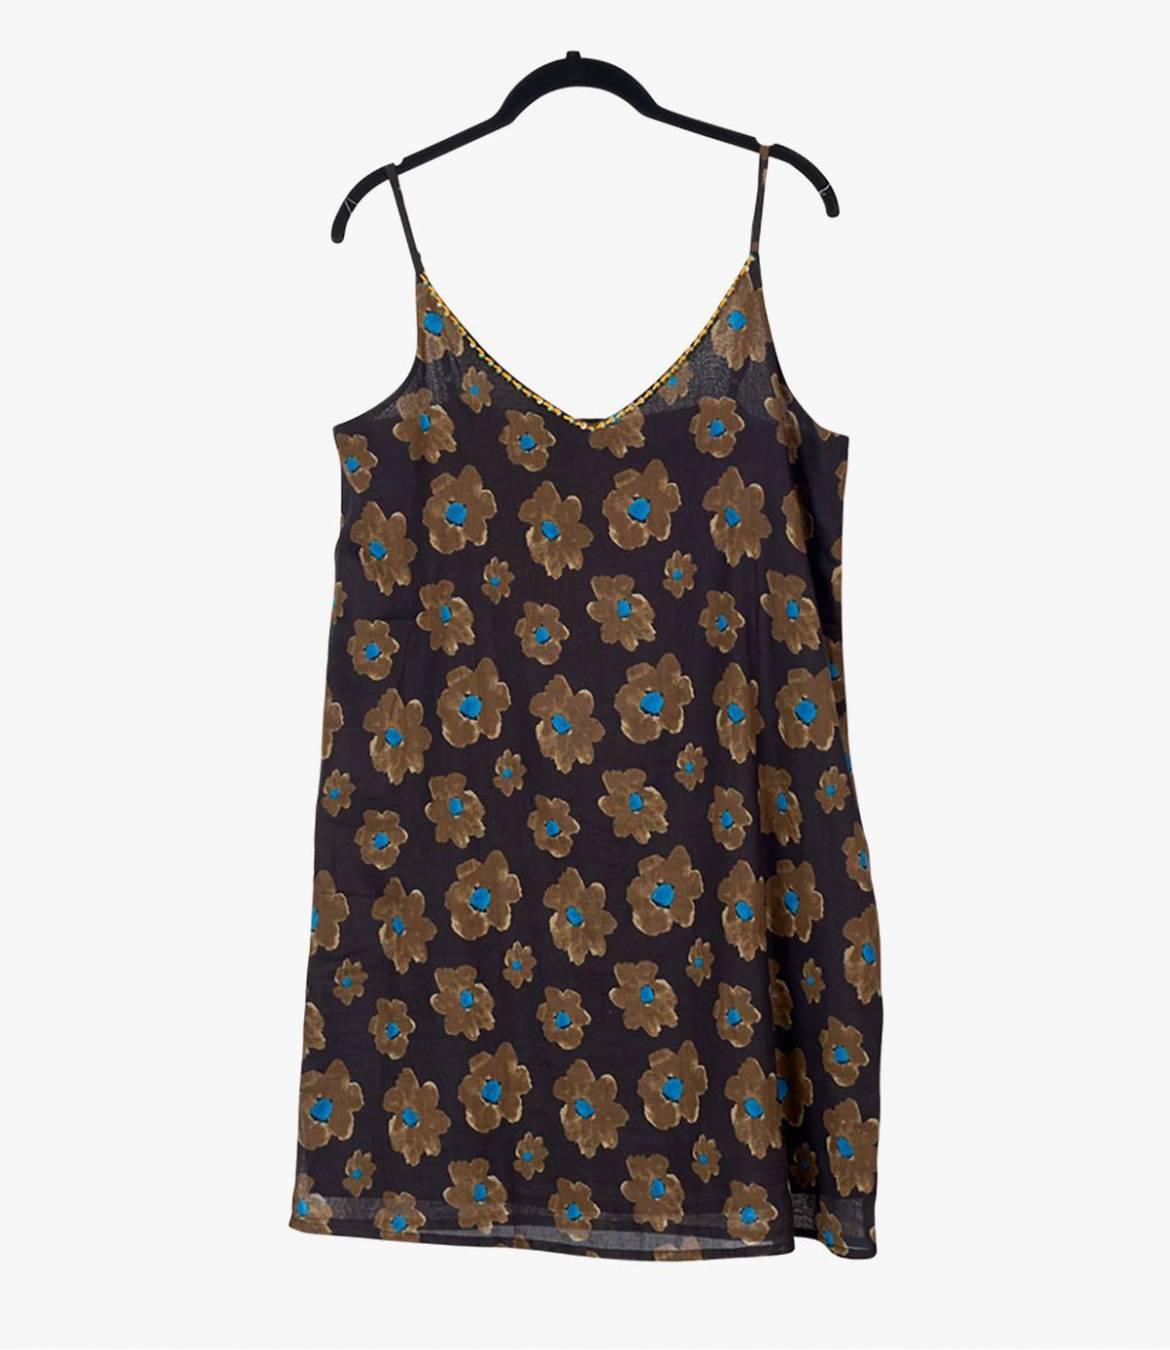 ALOA ASTER Cotton Dress for Women Storiatipic - 1